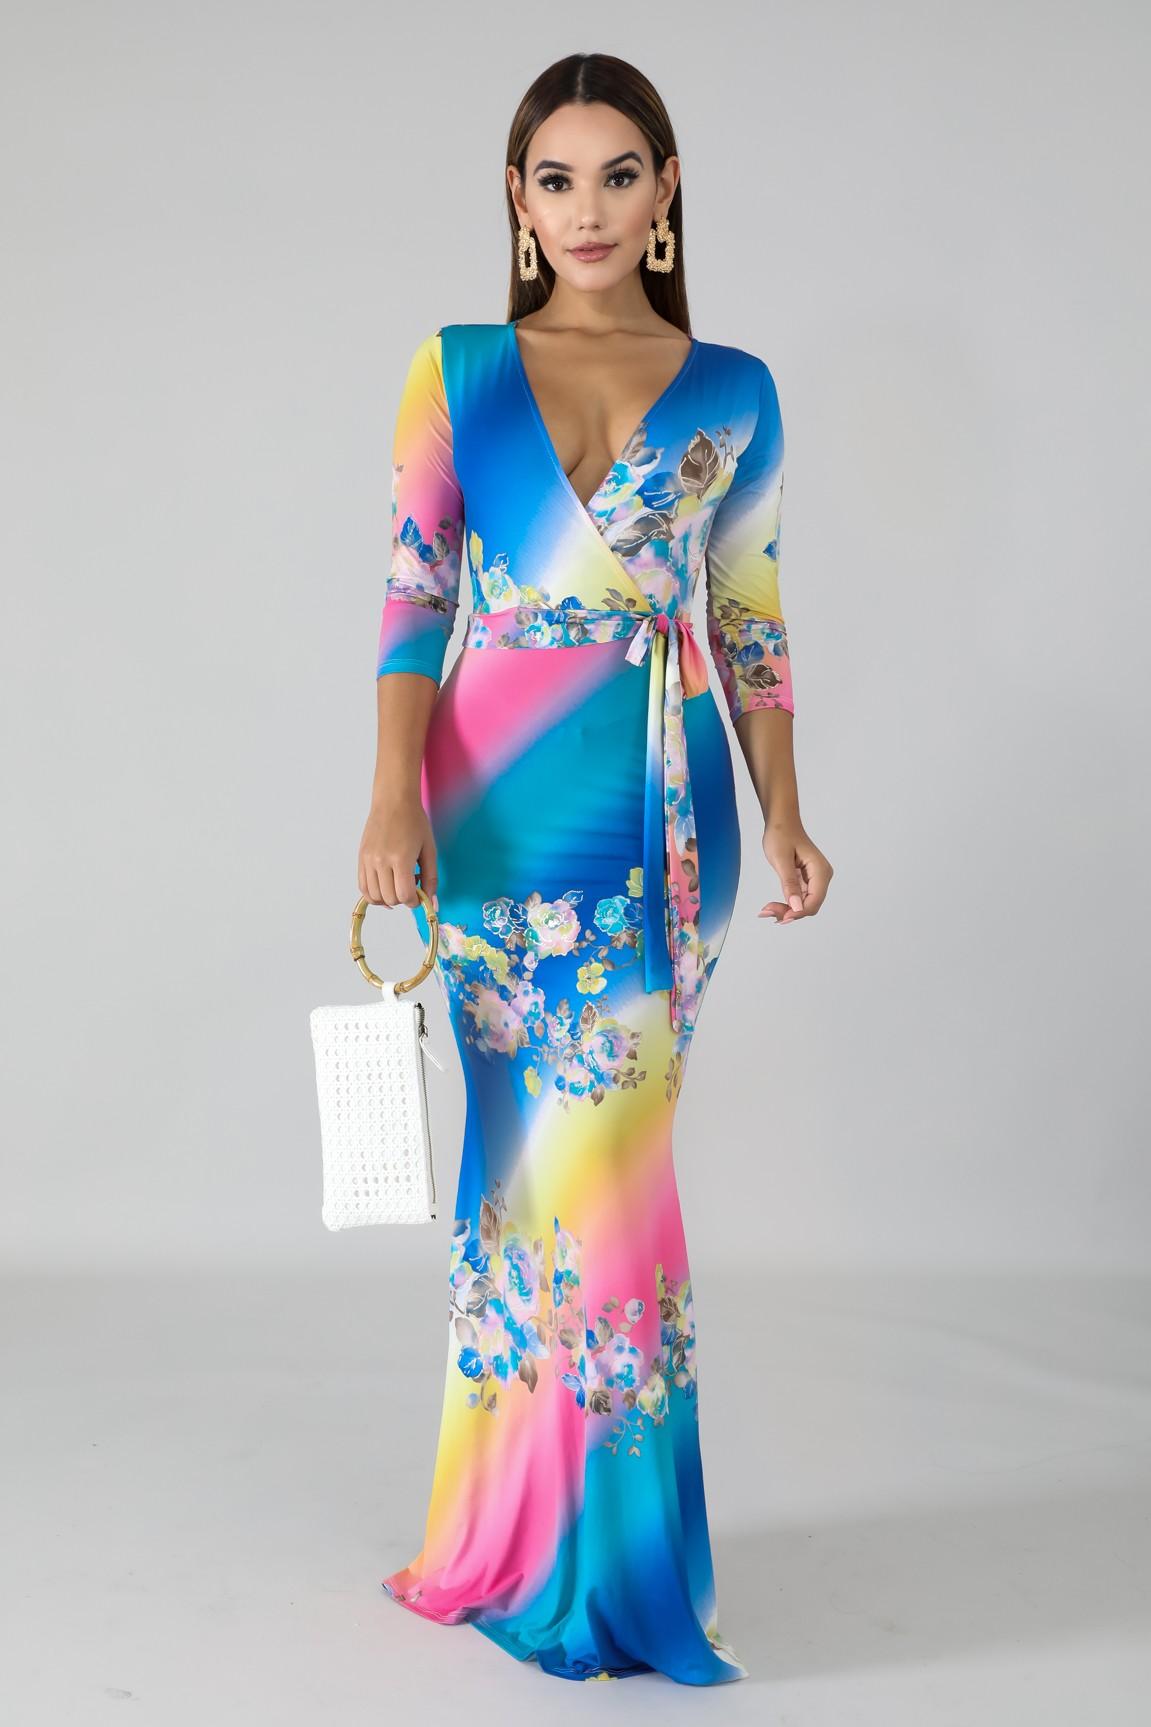 Porcelain Mermaid Dress